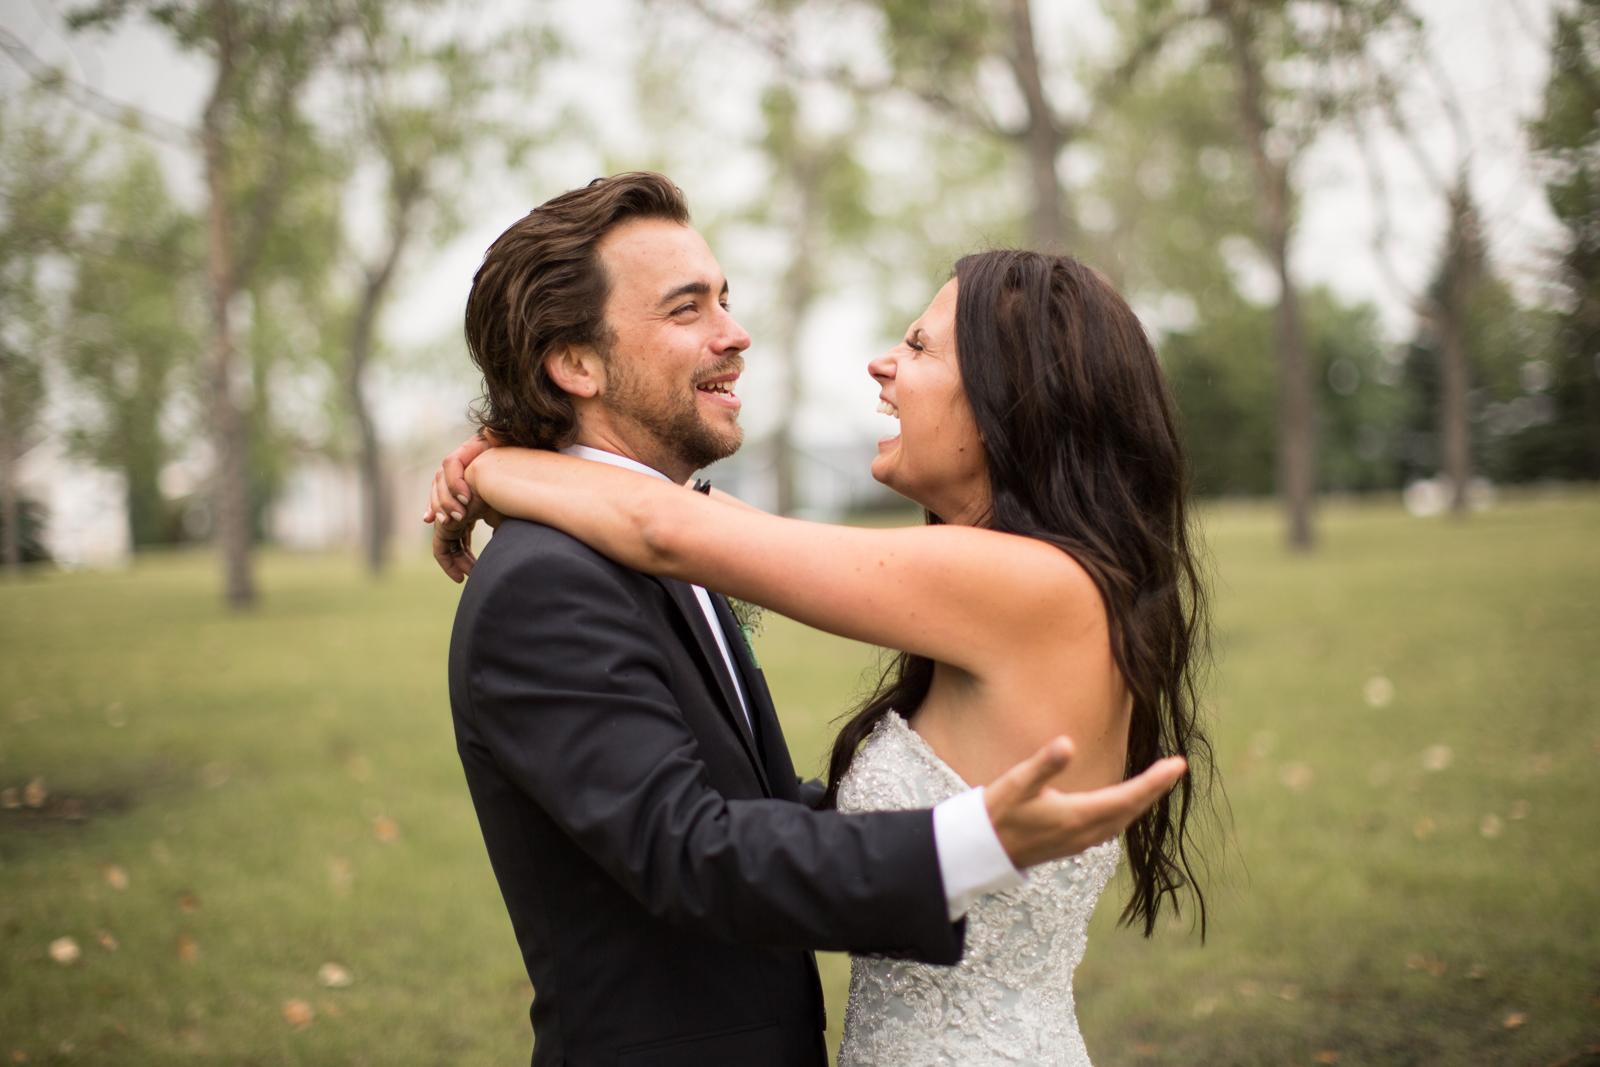 117Andrew_Pavlidis_Photography_Zaneta_and_Jeff_Calgary_Wedding-987422